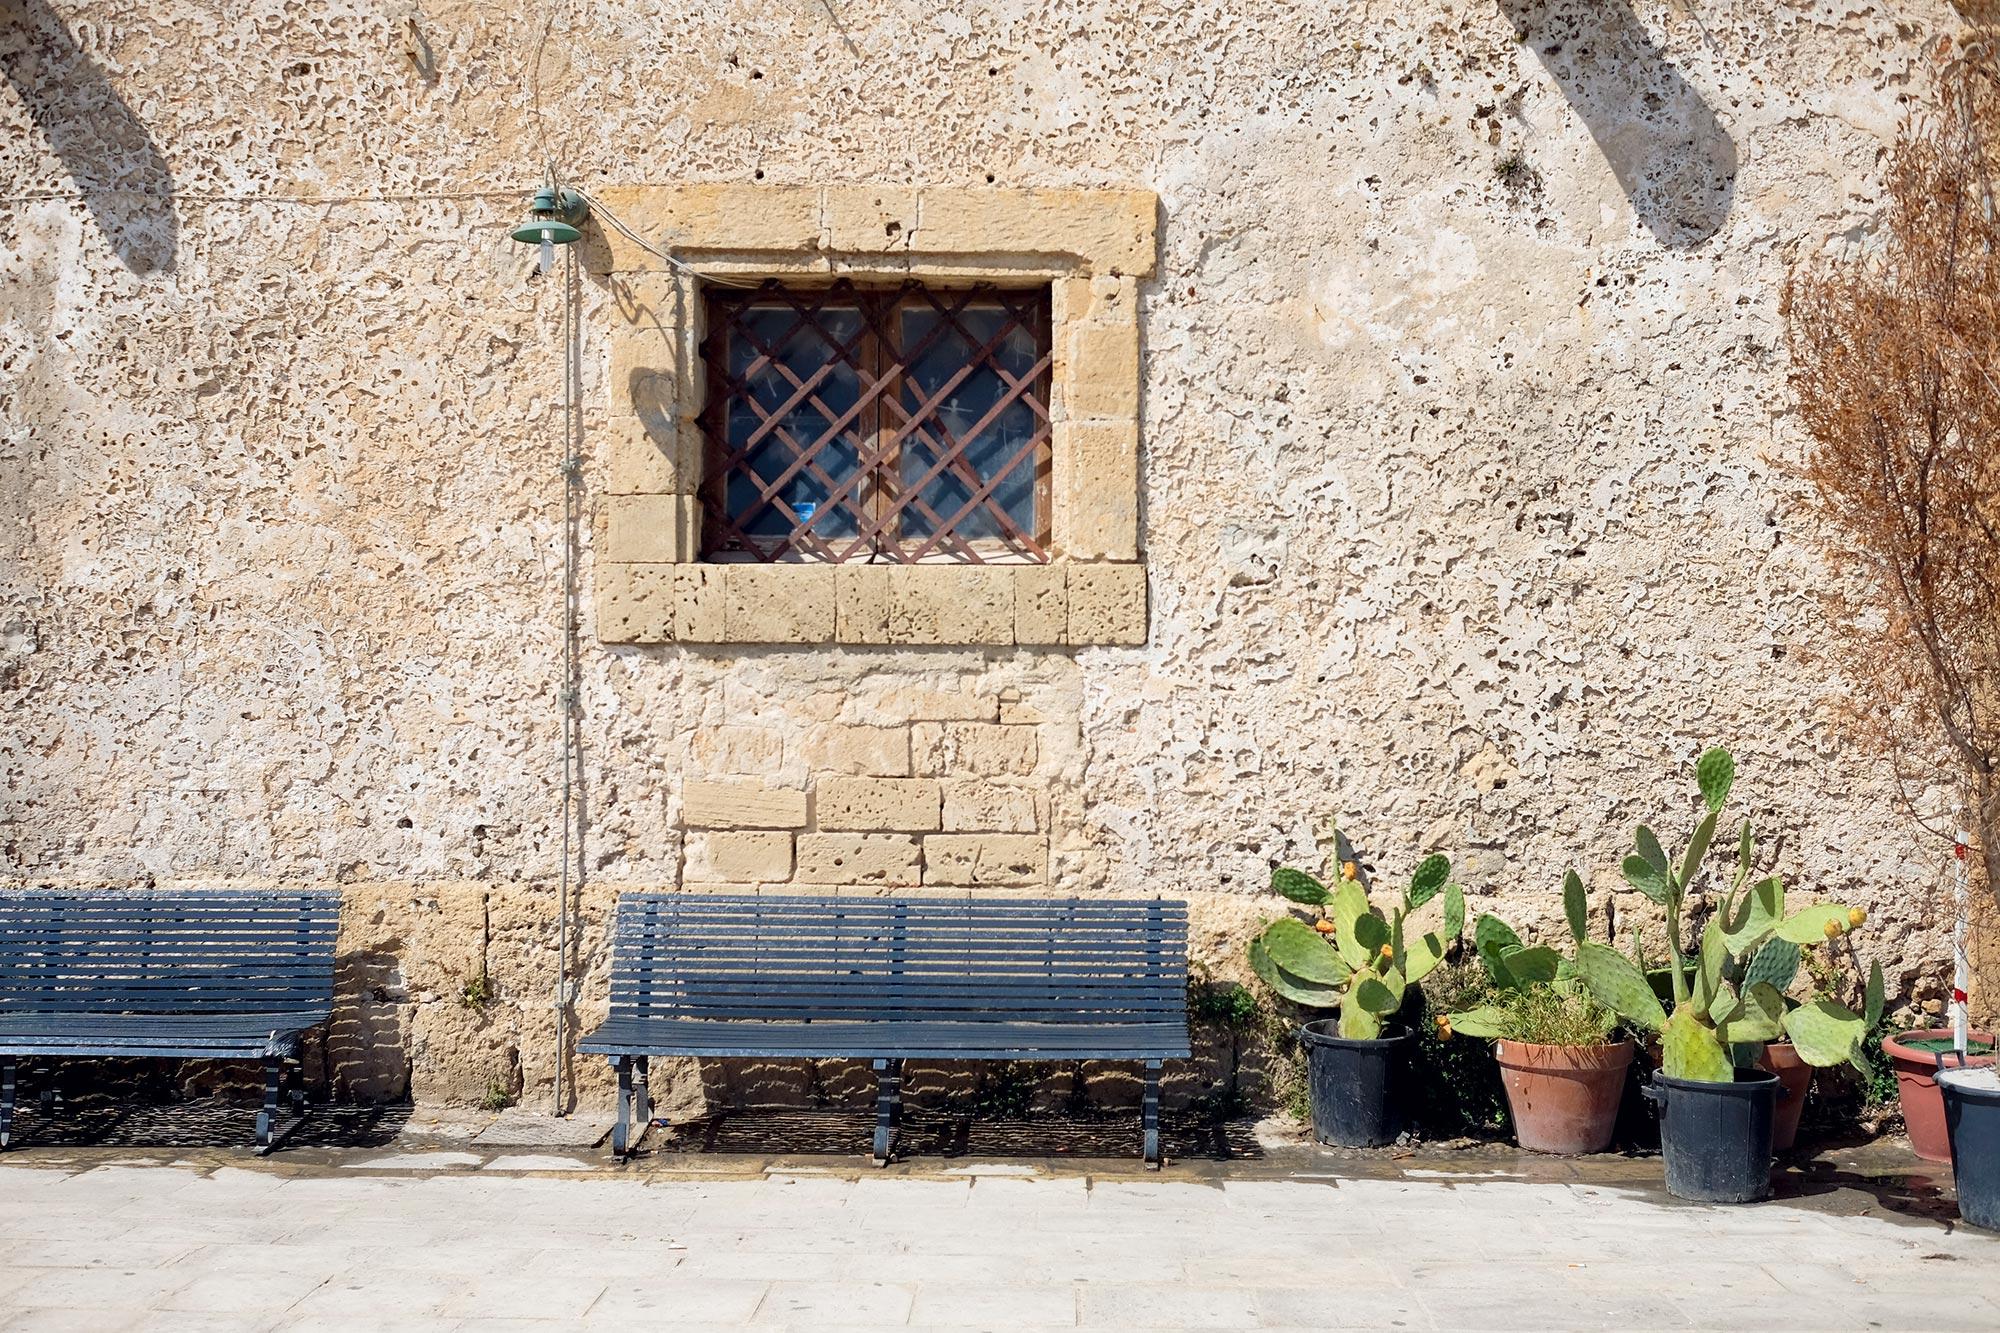 italy-sicilia-marzamemi-tonnara9